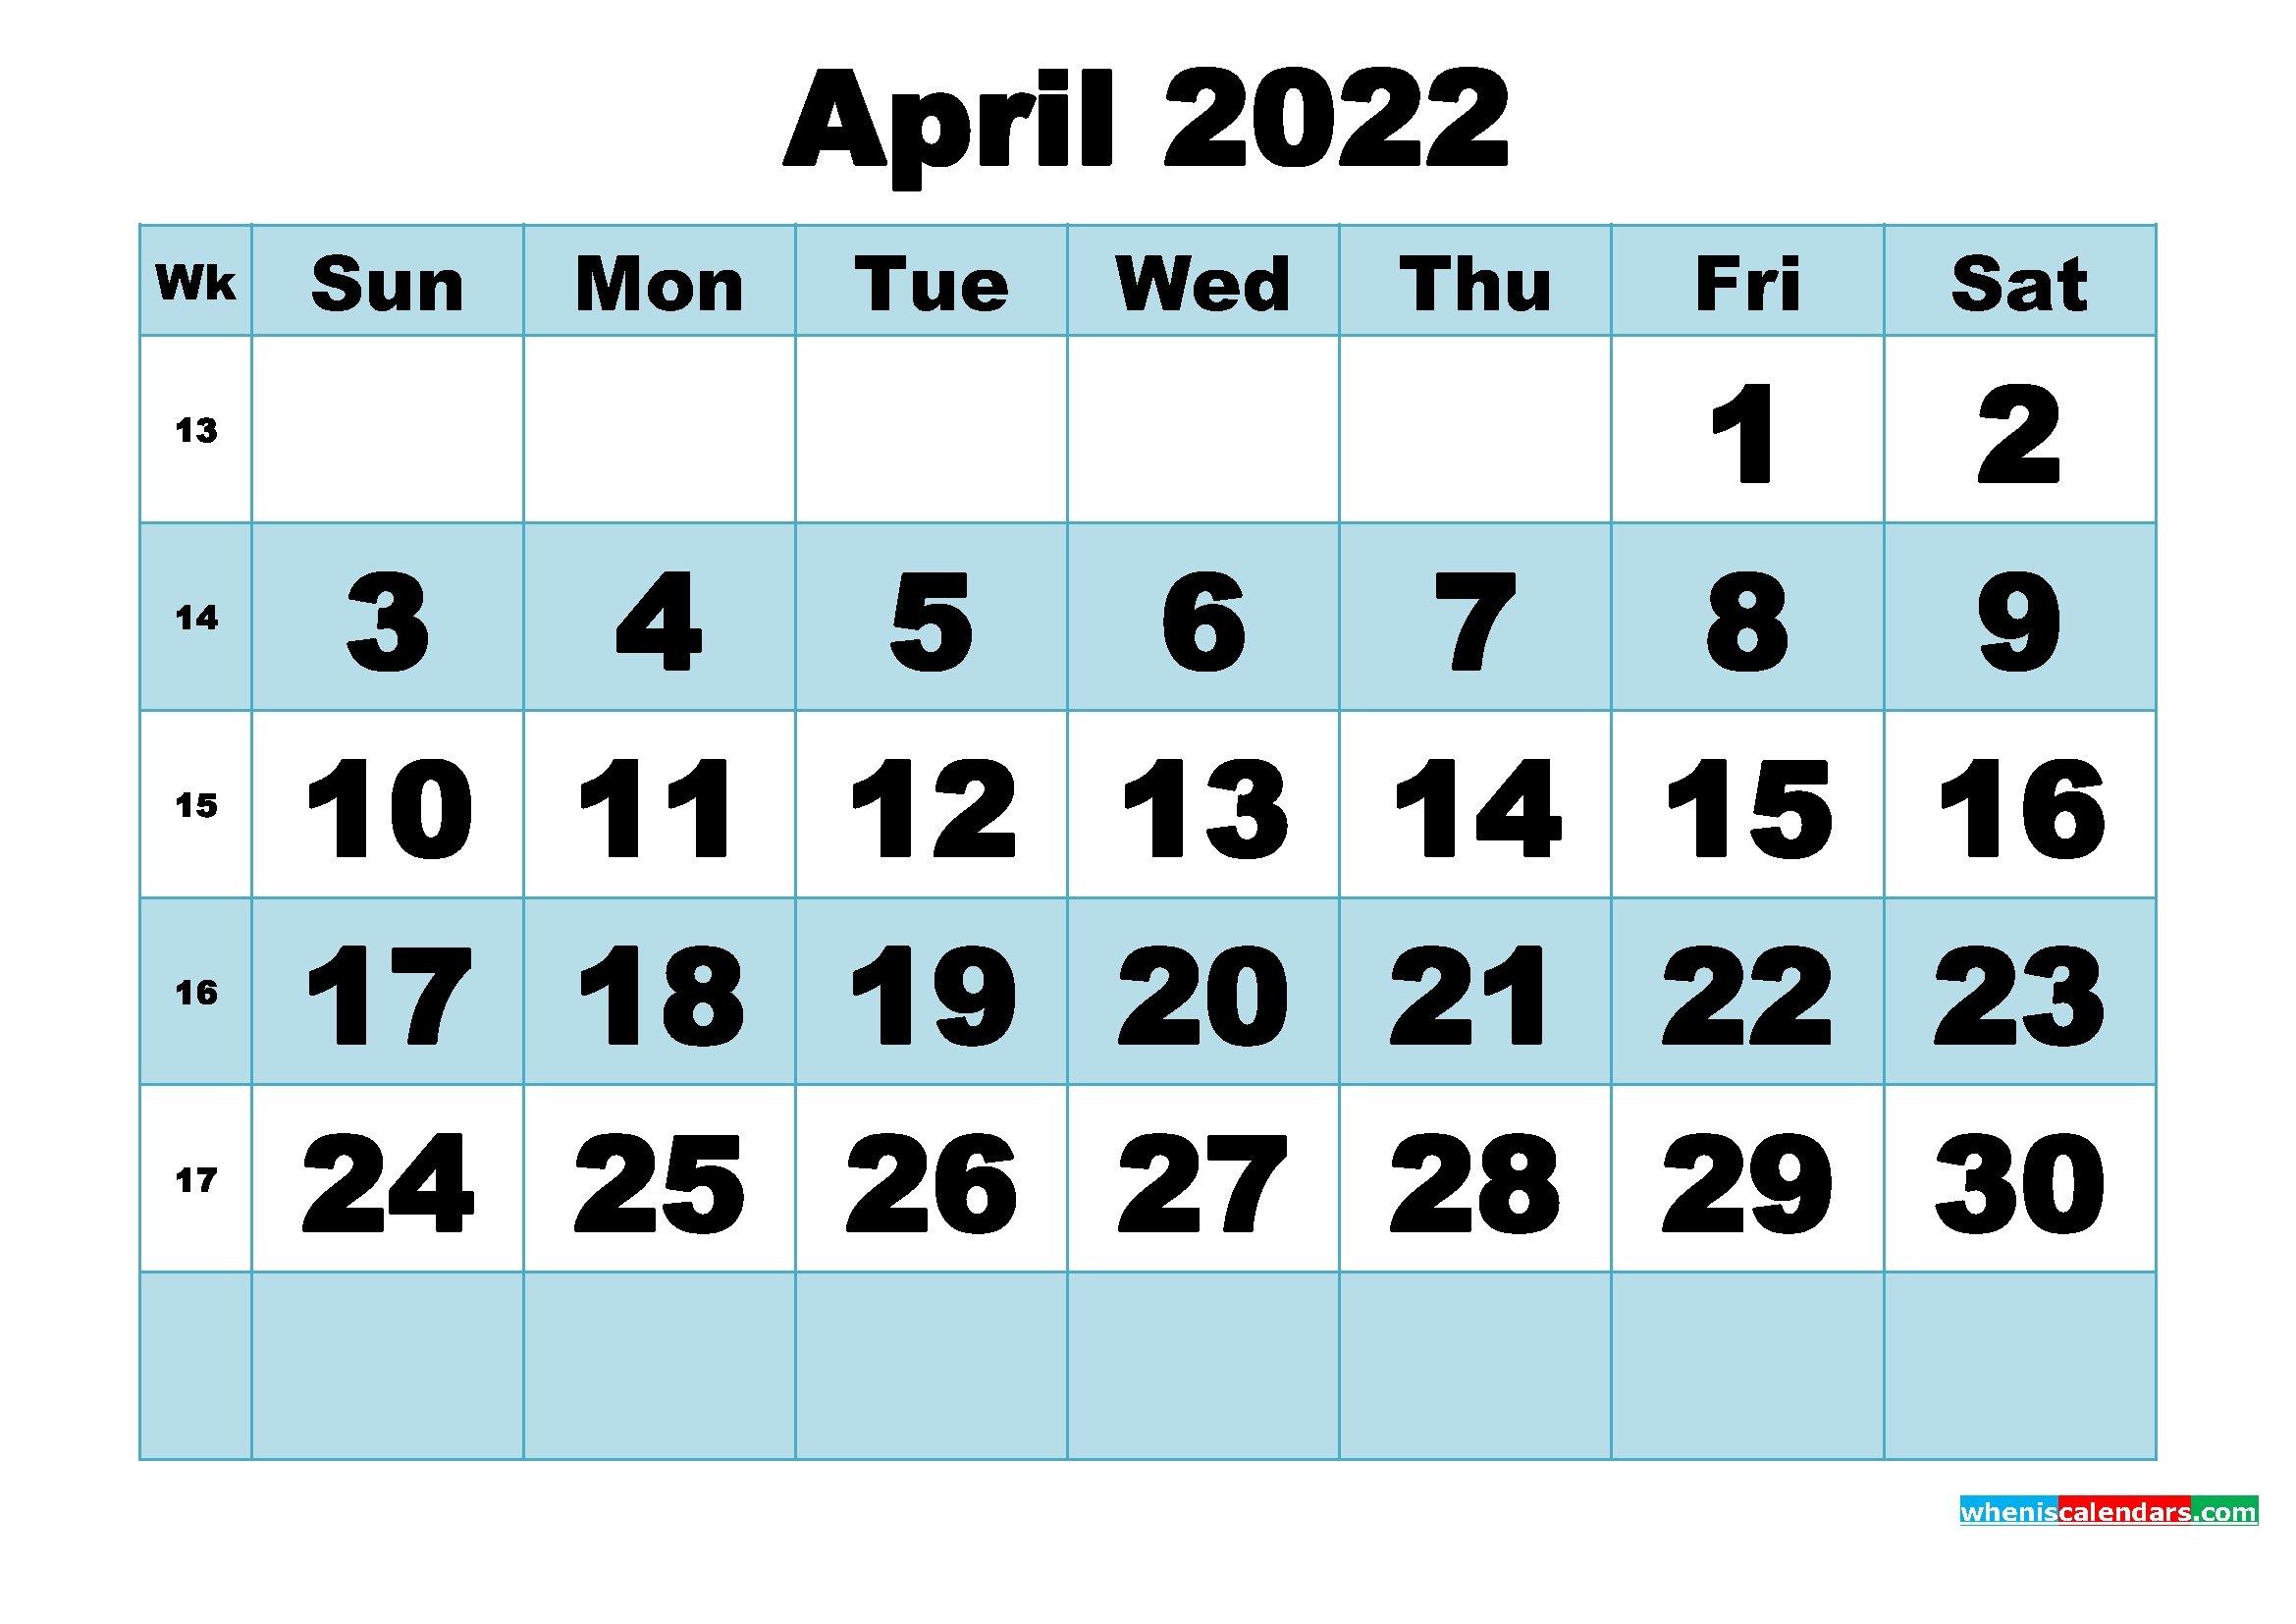 Free Printable April 2022 Calendar Word, Pdf, Image